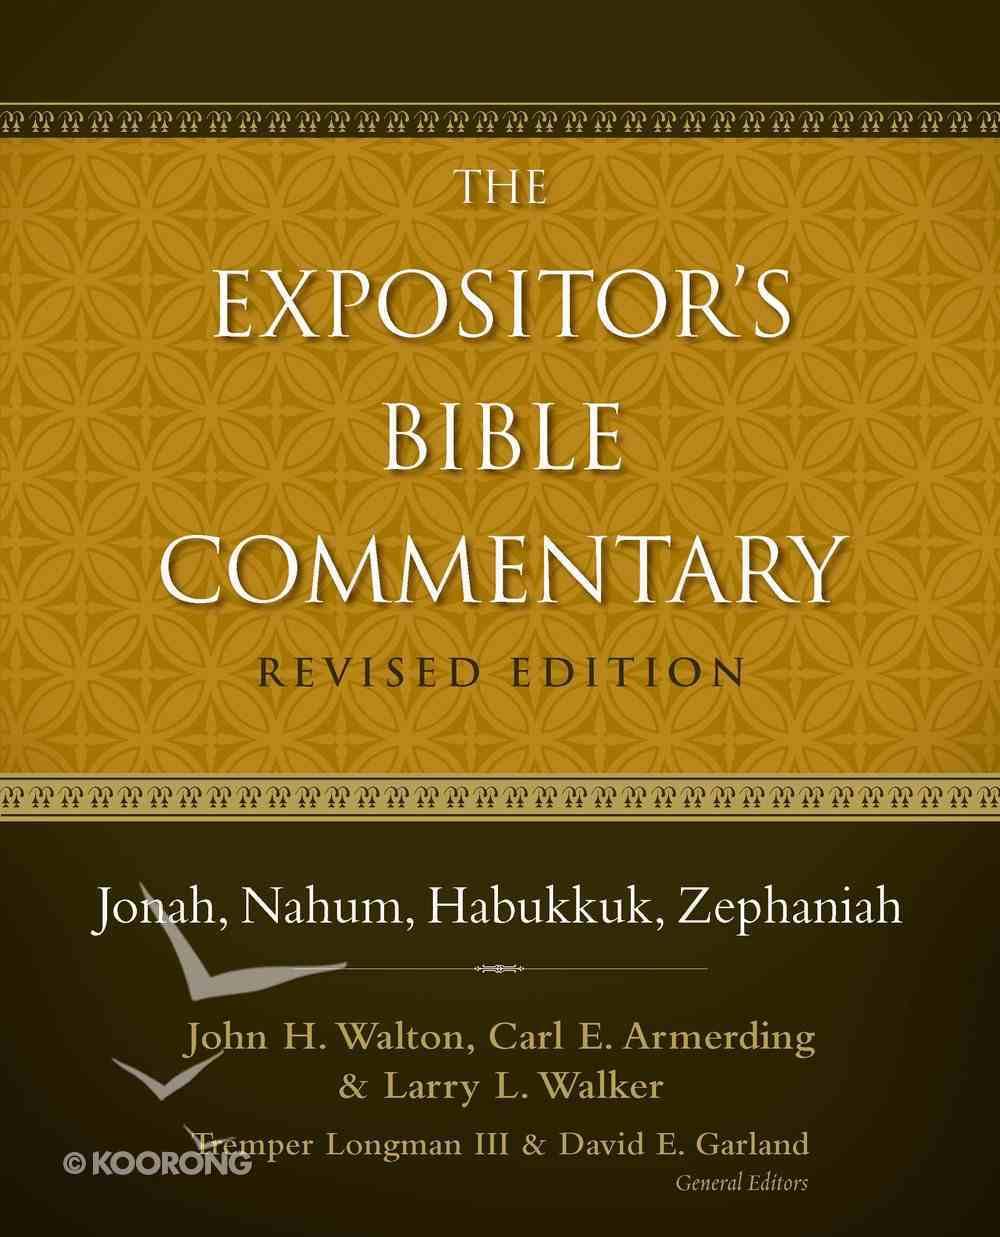 Jonah, Nahum, Habukkuk, Zephaniah (#08 in Expositor's Bible Commentary Revised Series) eBook